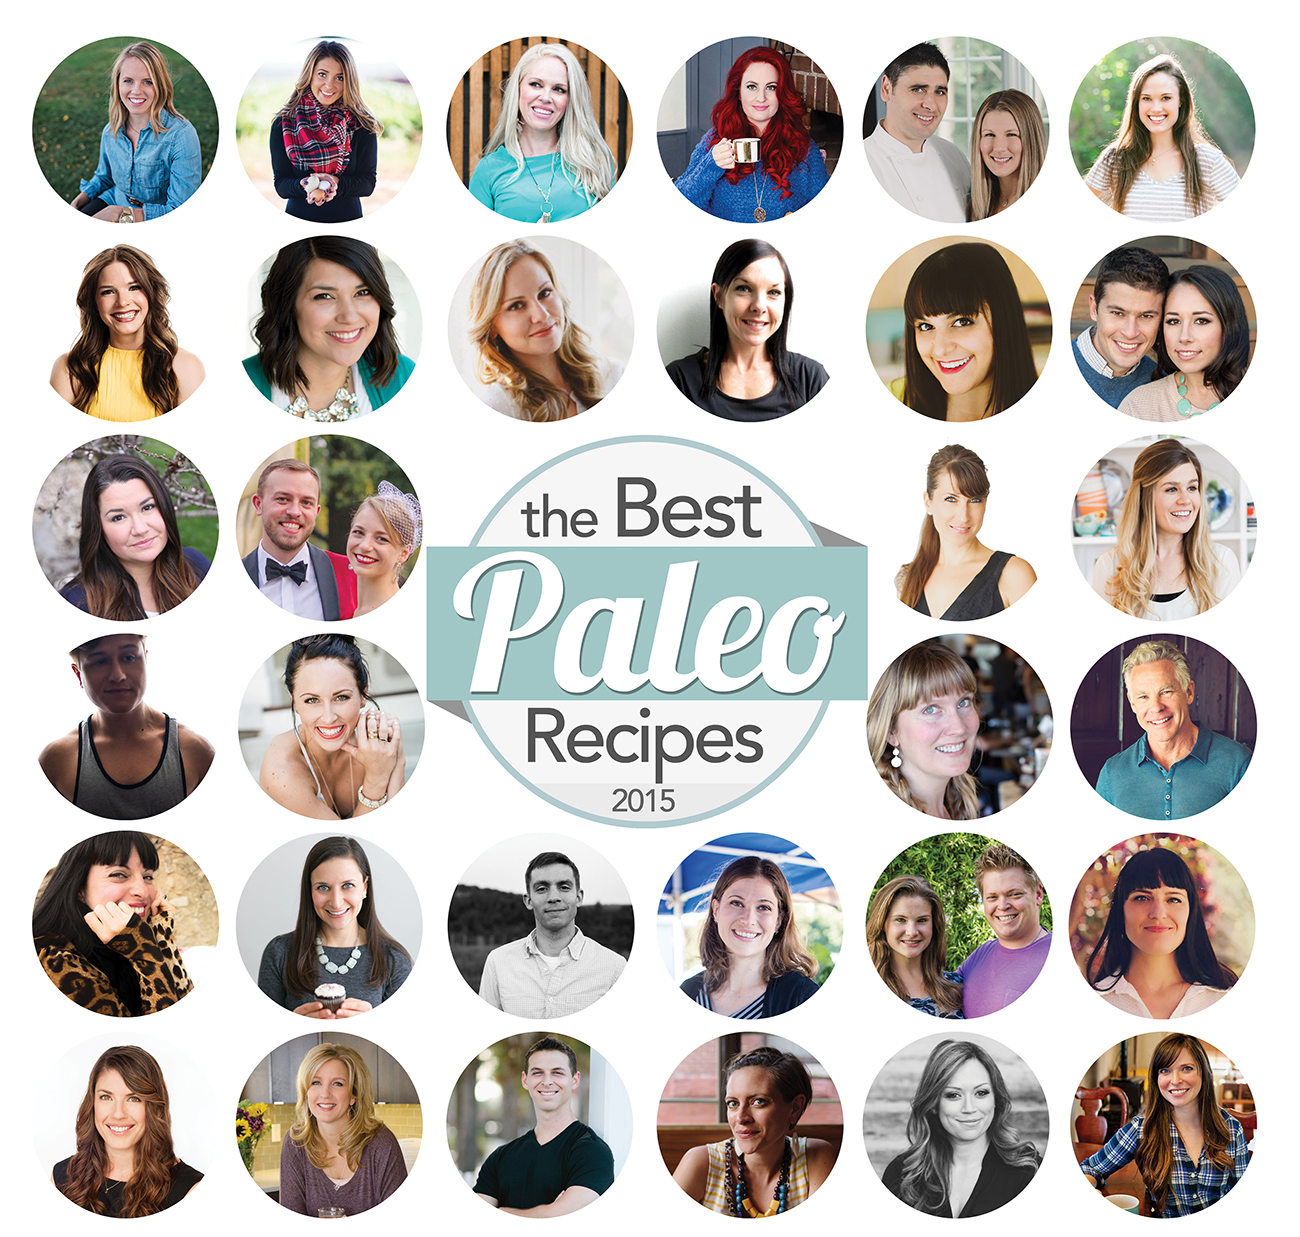 The Best Paleo Recipes of 2015 Contributors